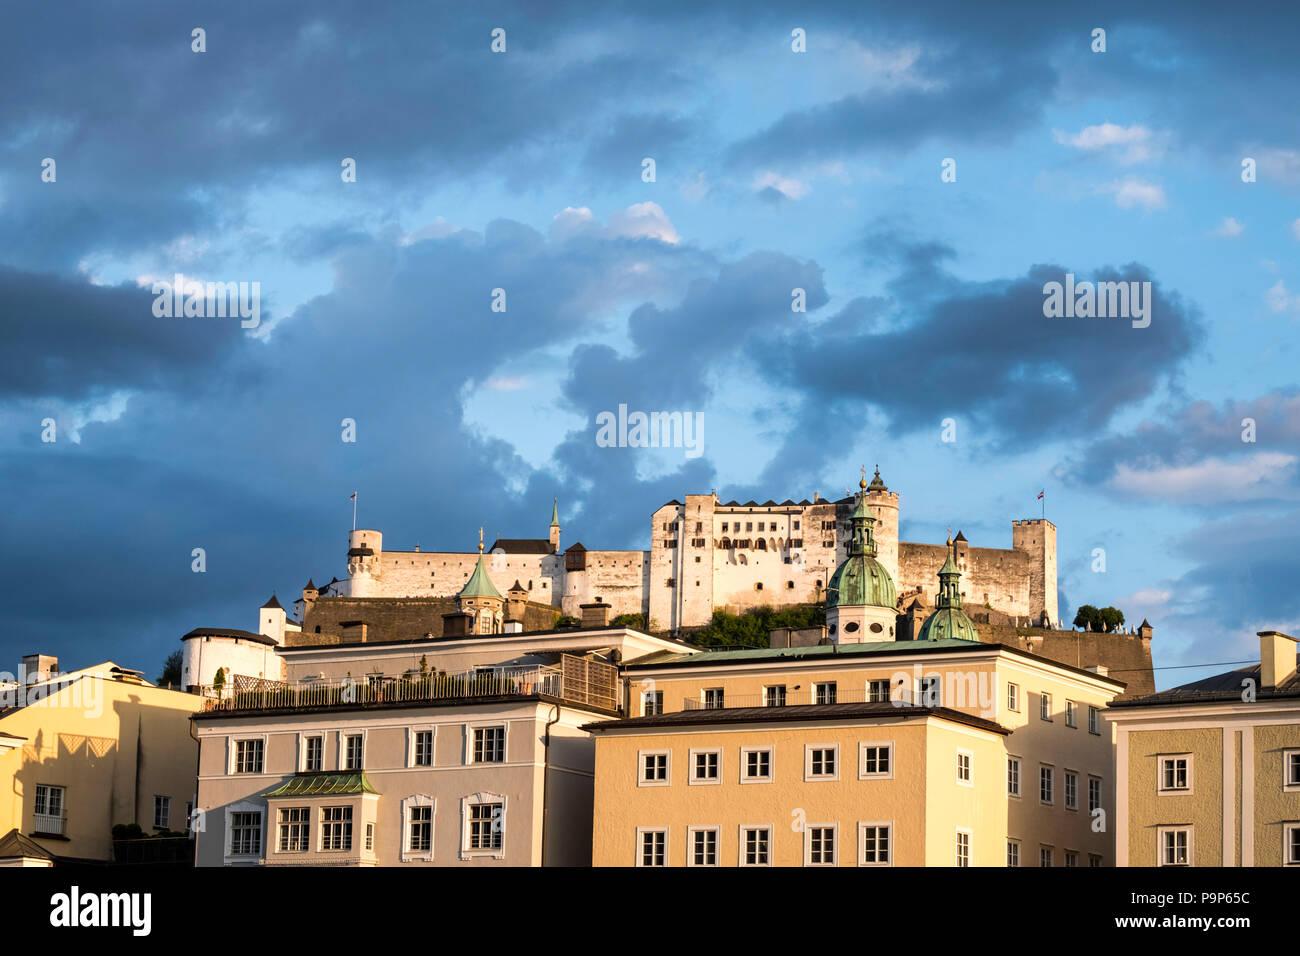 Salzburg cityscape with Fortress Hohensalzburg at dusk - Stock Image